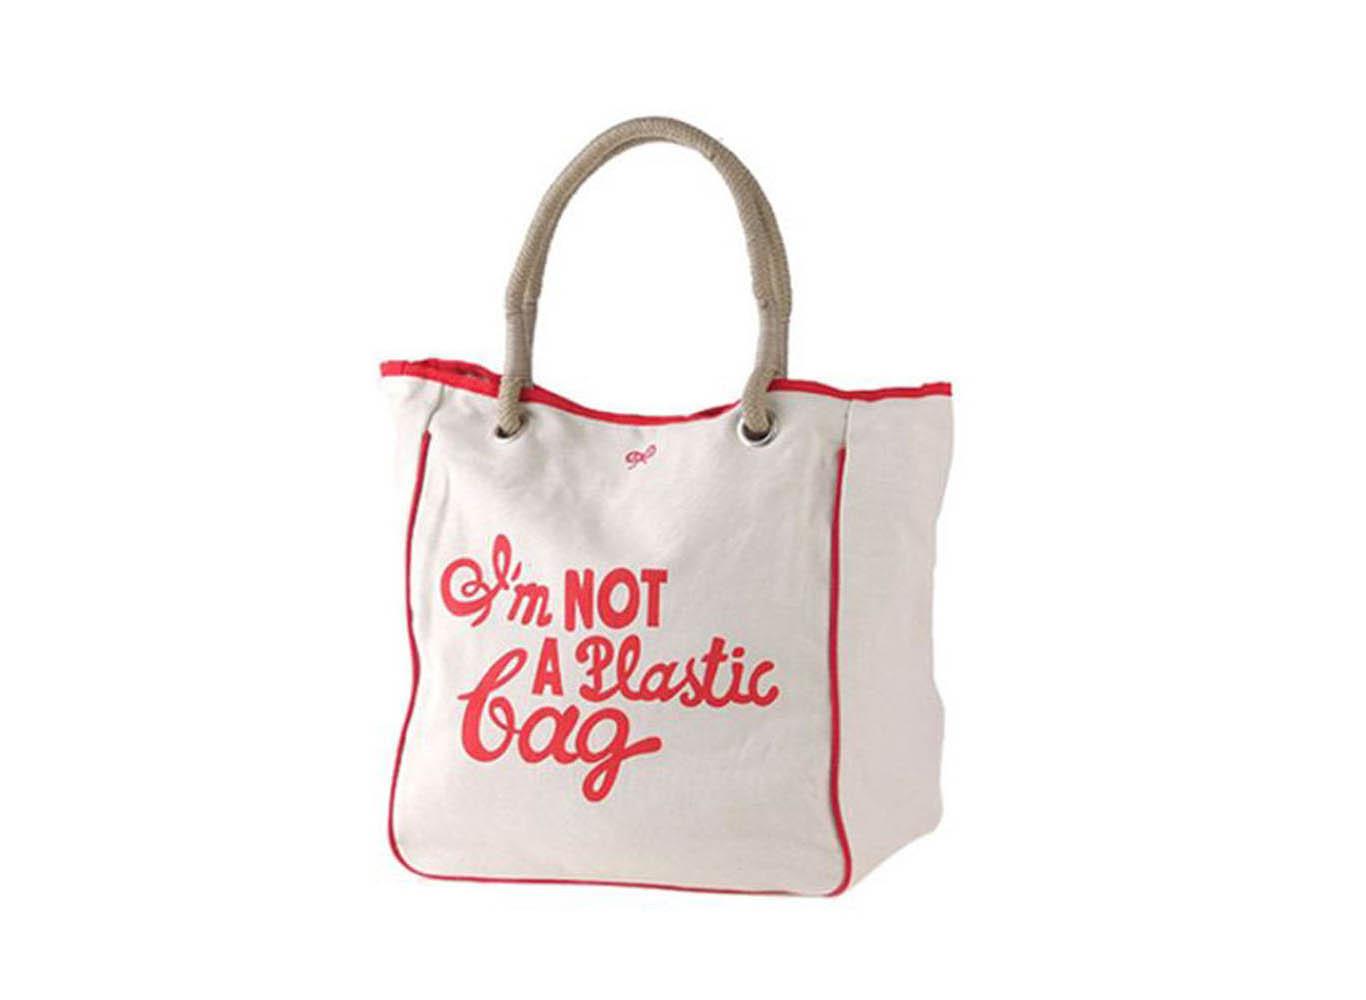 Custom Printed Canvas Tote Shopping Bag